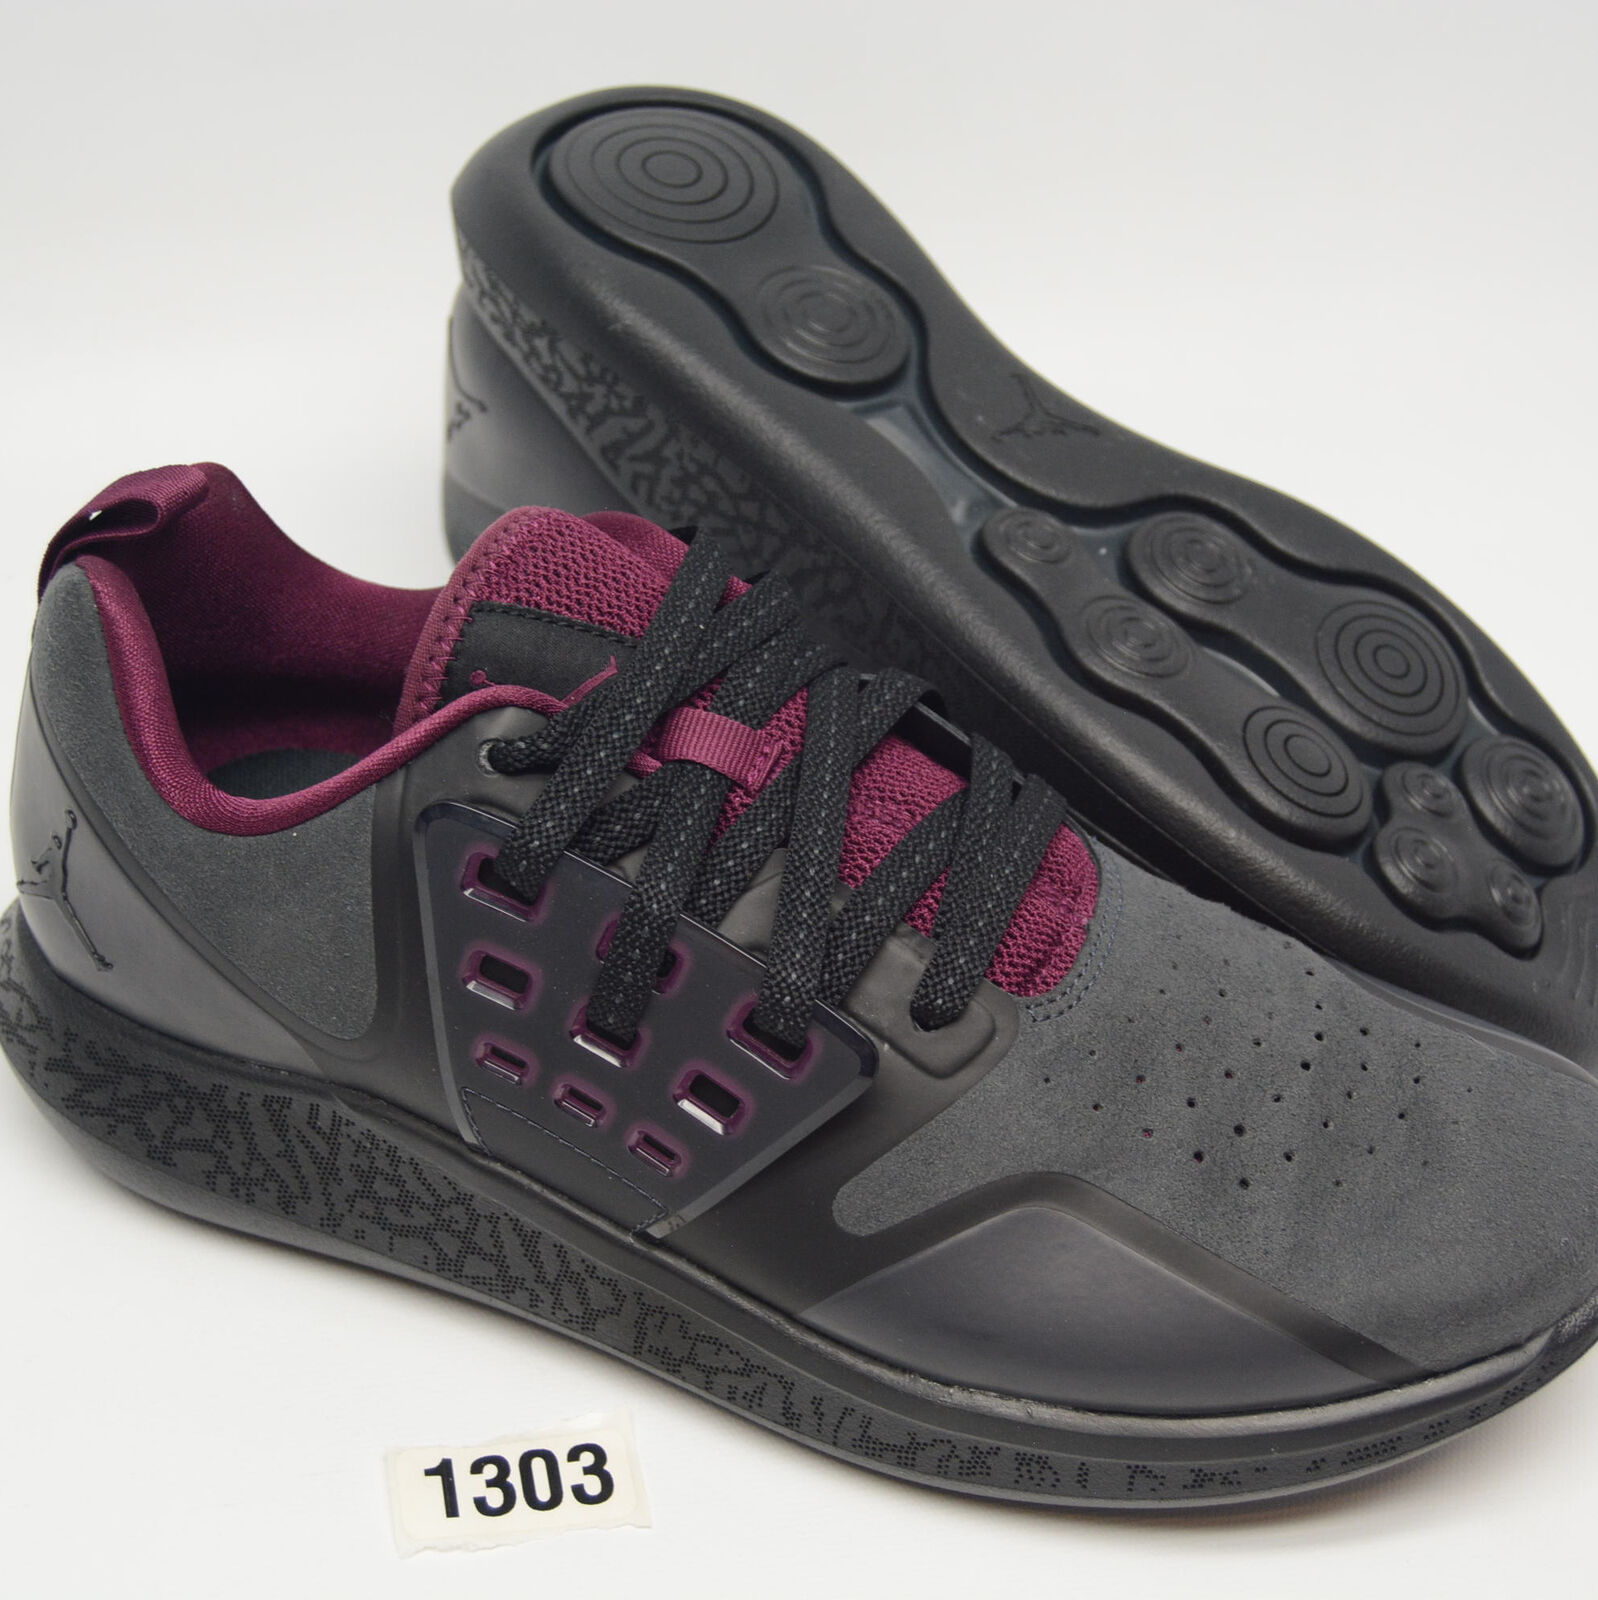 NIKE AIR JORDAN LUNAR GRIND Black Training shoes Mens 9.5 NEW AA4302-017